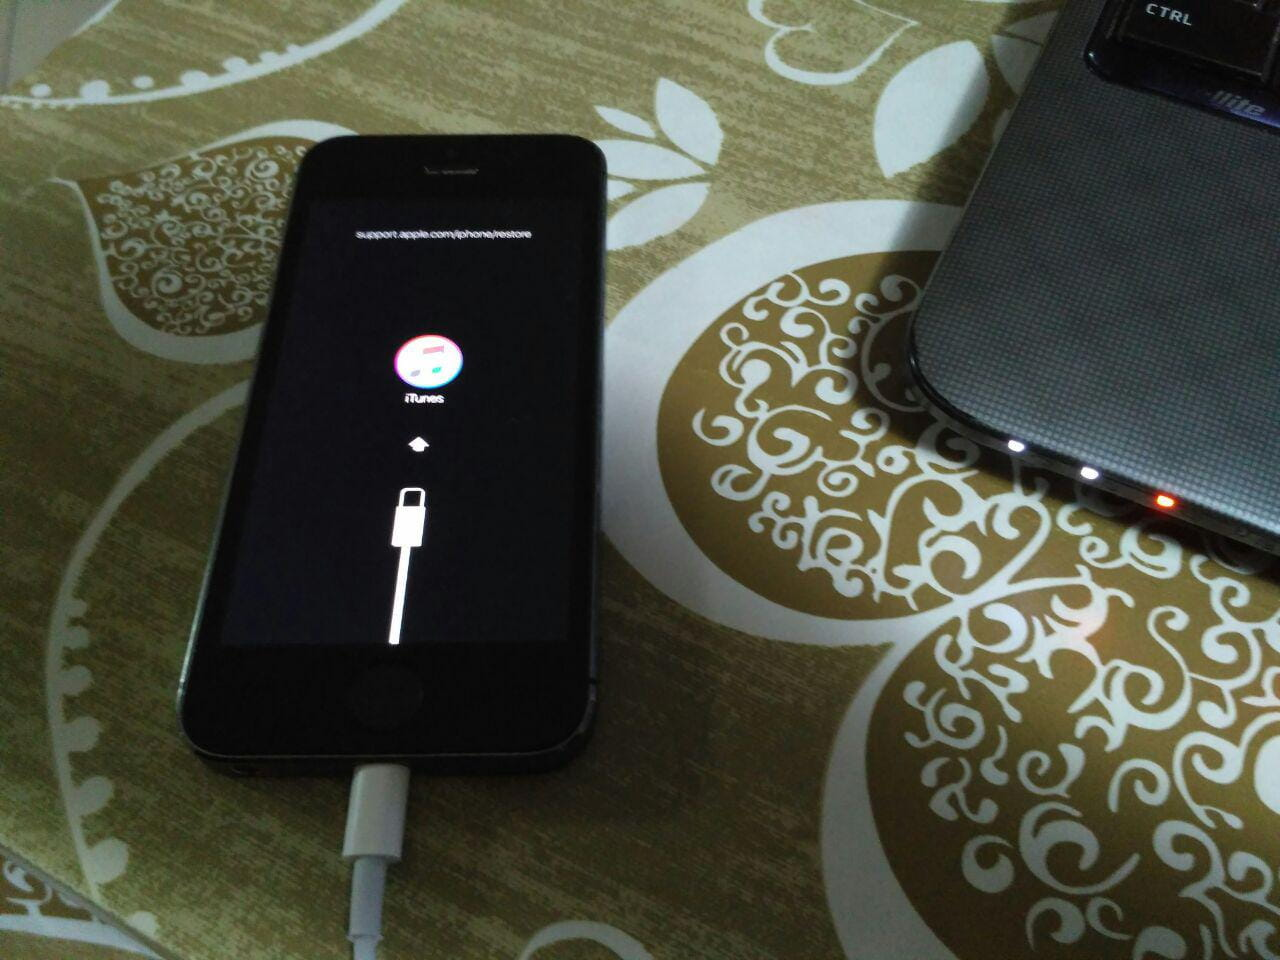 iPhone - Modalità di recupero